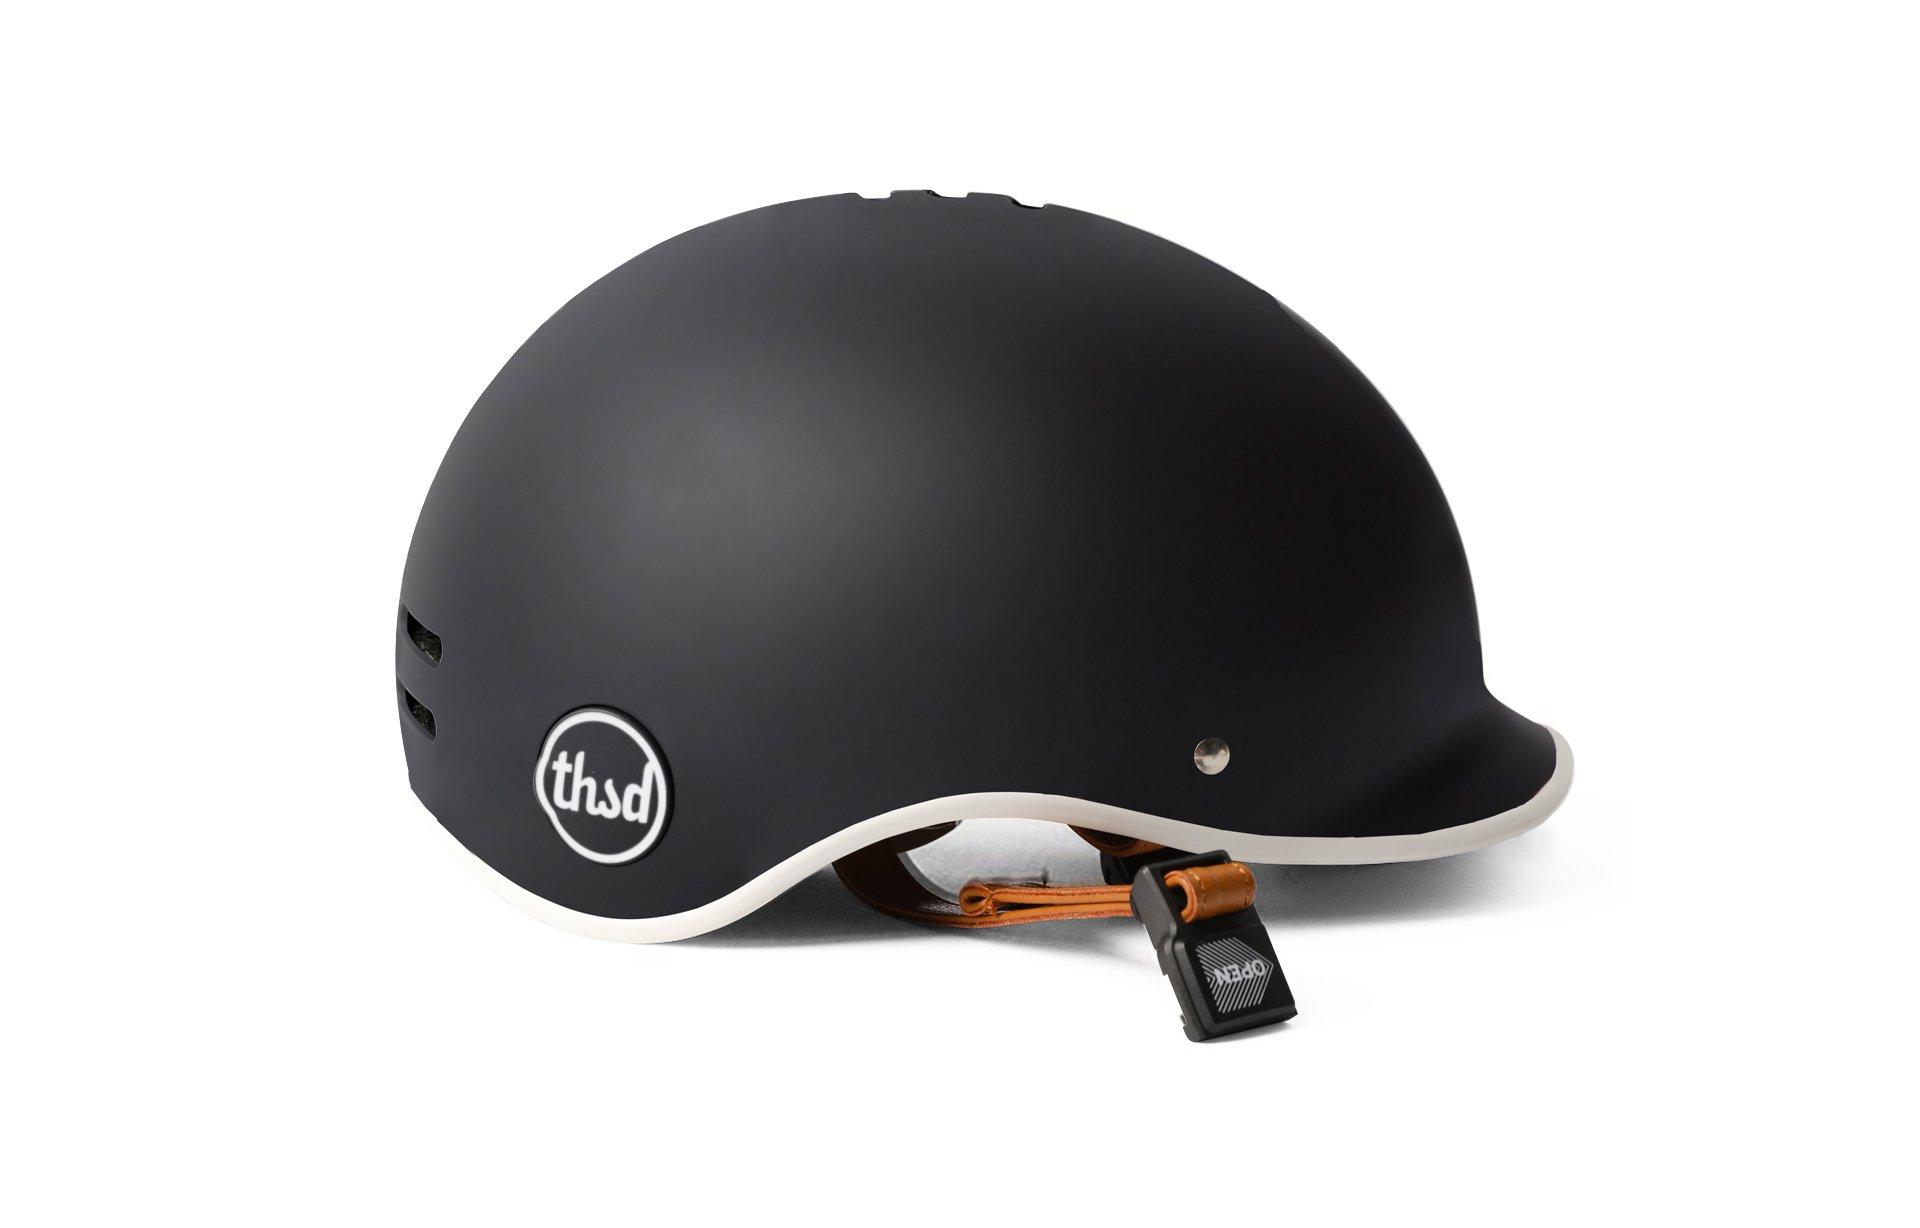 Thousand Adult Bike Helmet Black Small